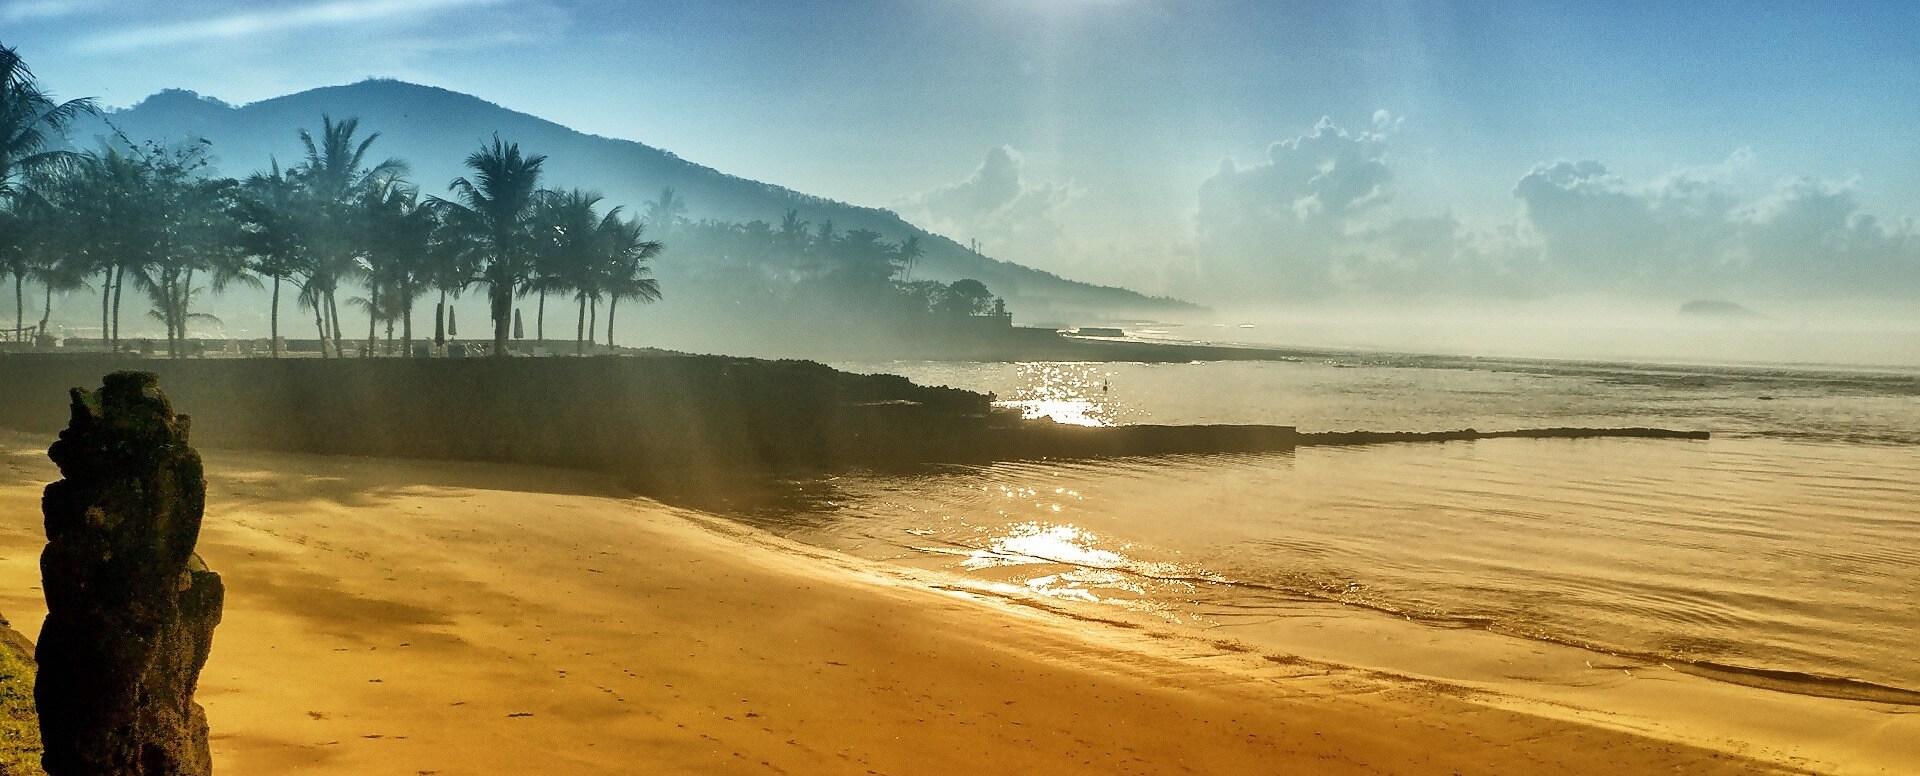 beauty of beaches essay